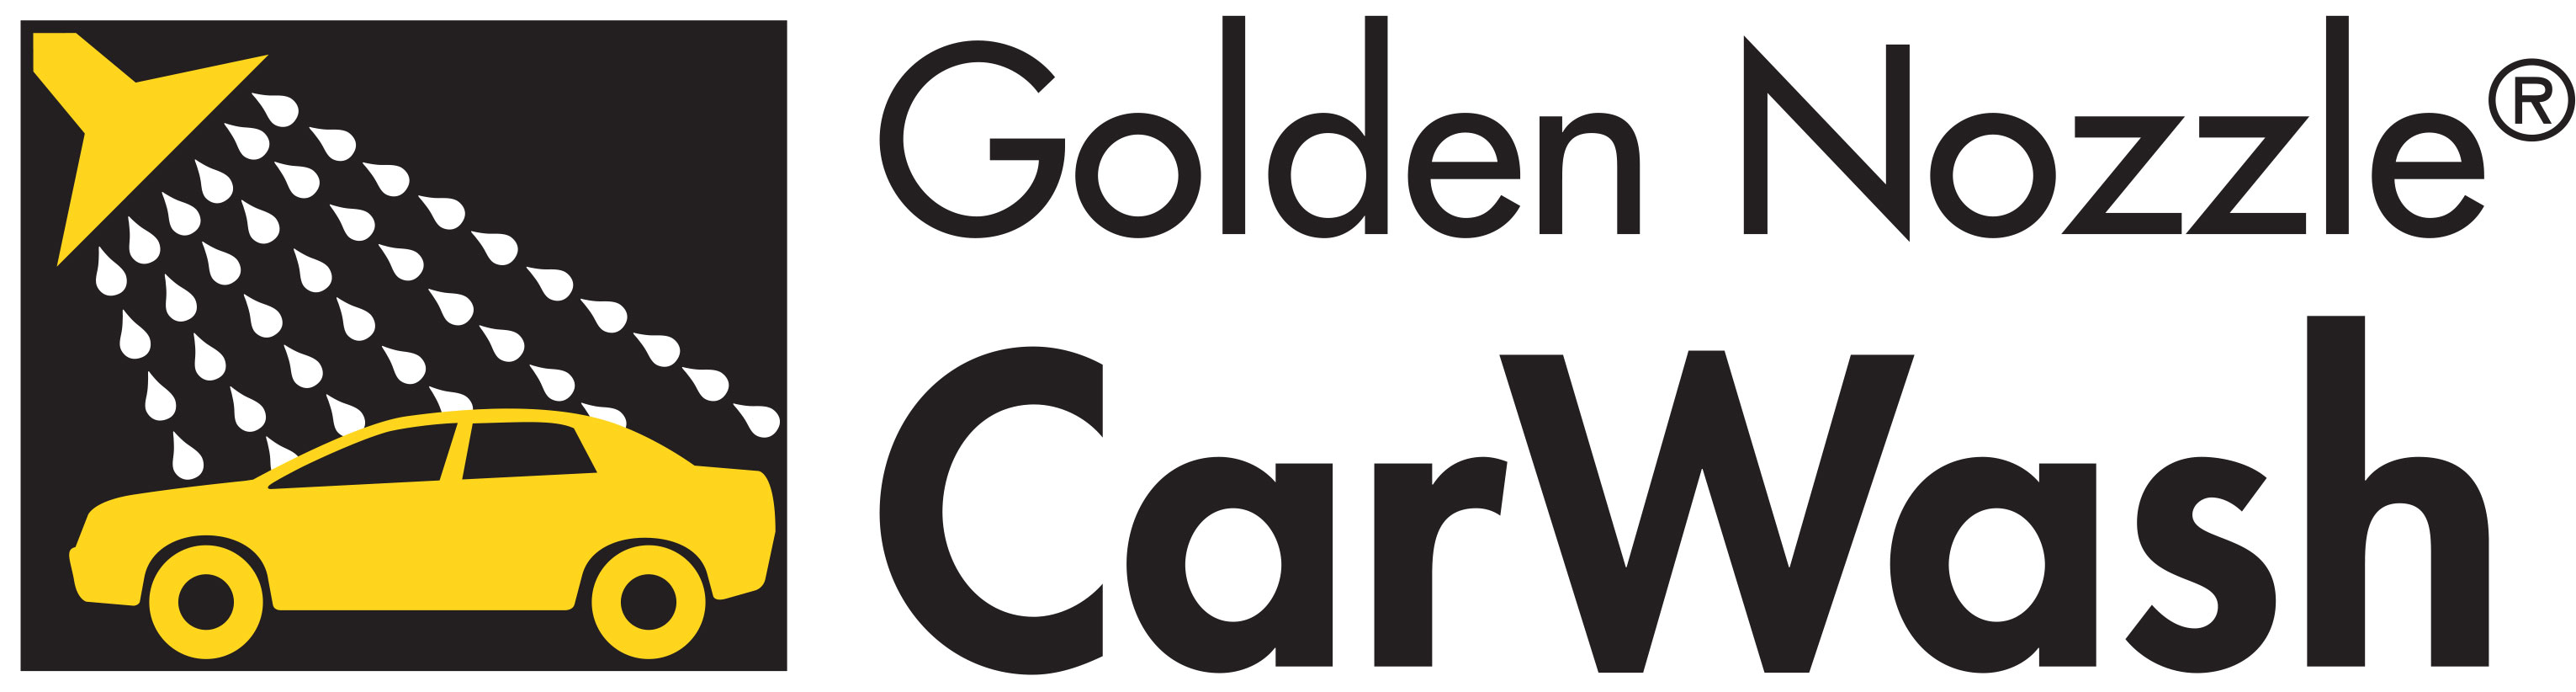 Golden Nozzle Car Wash